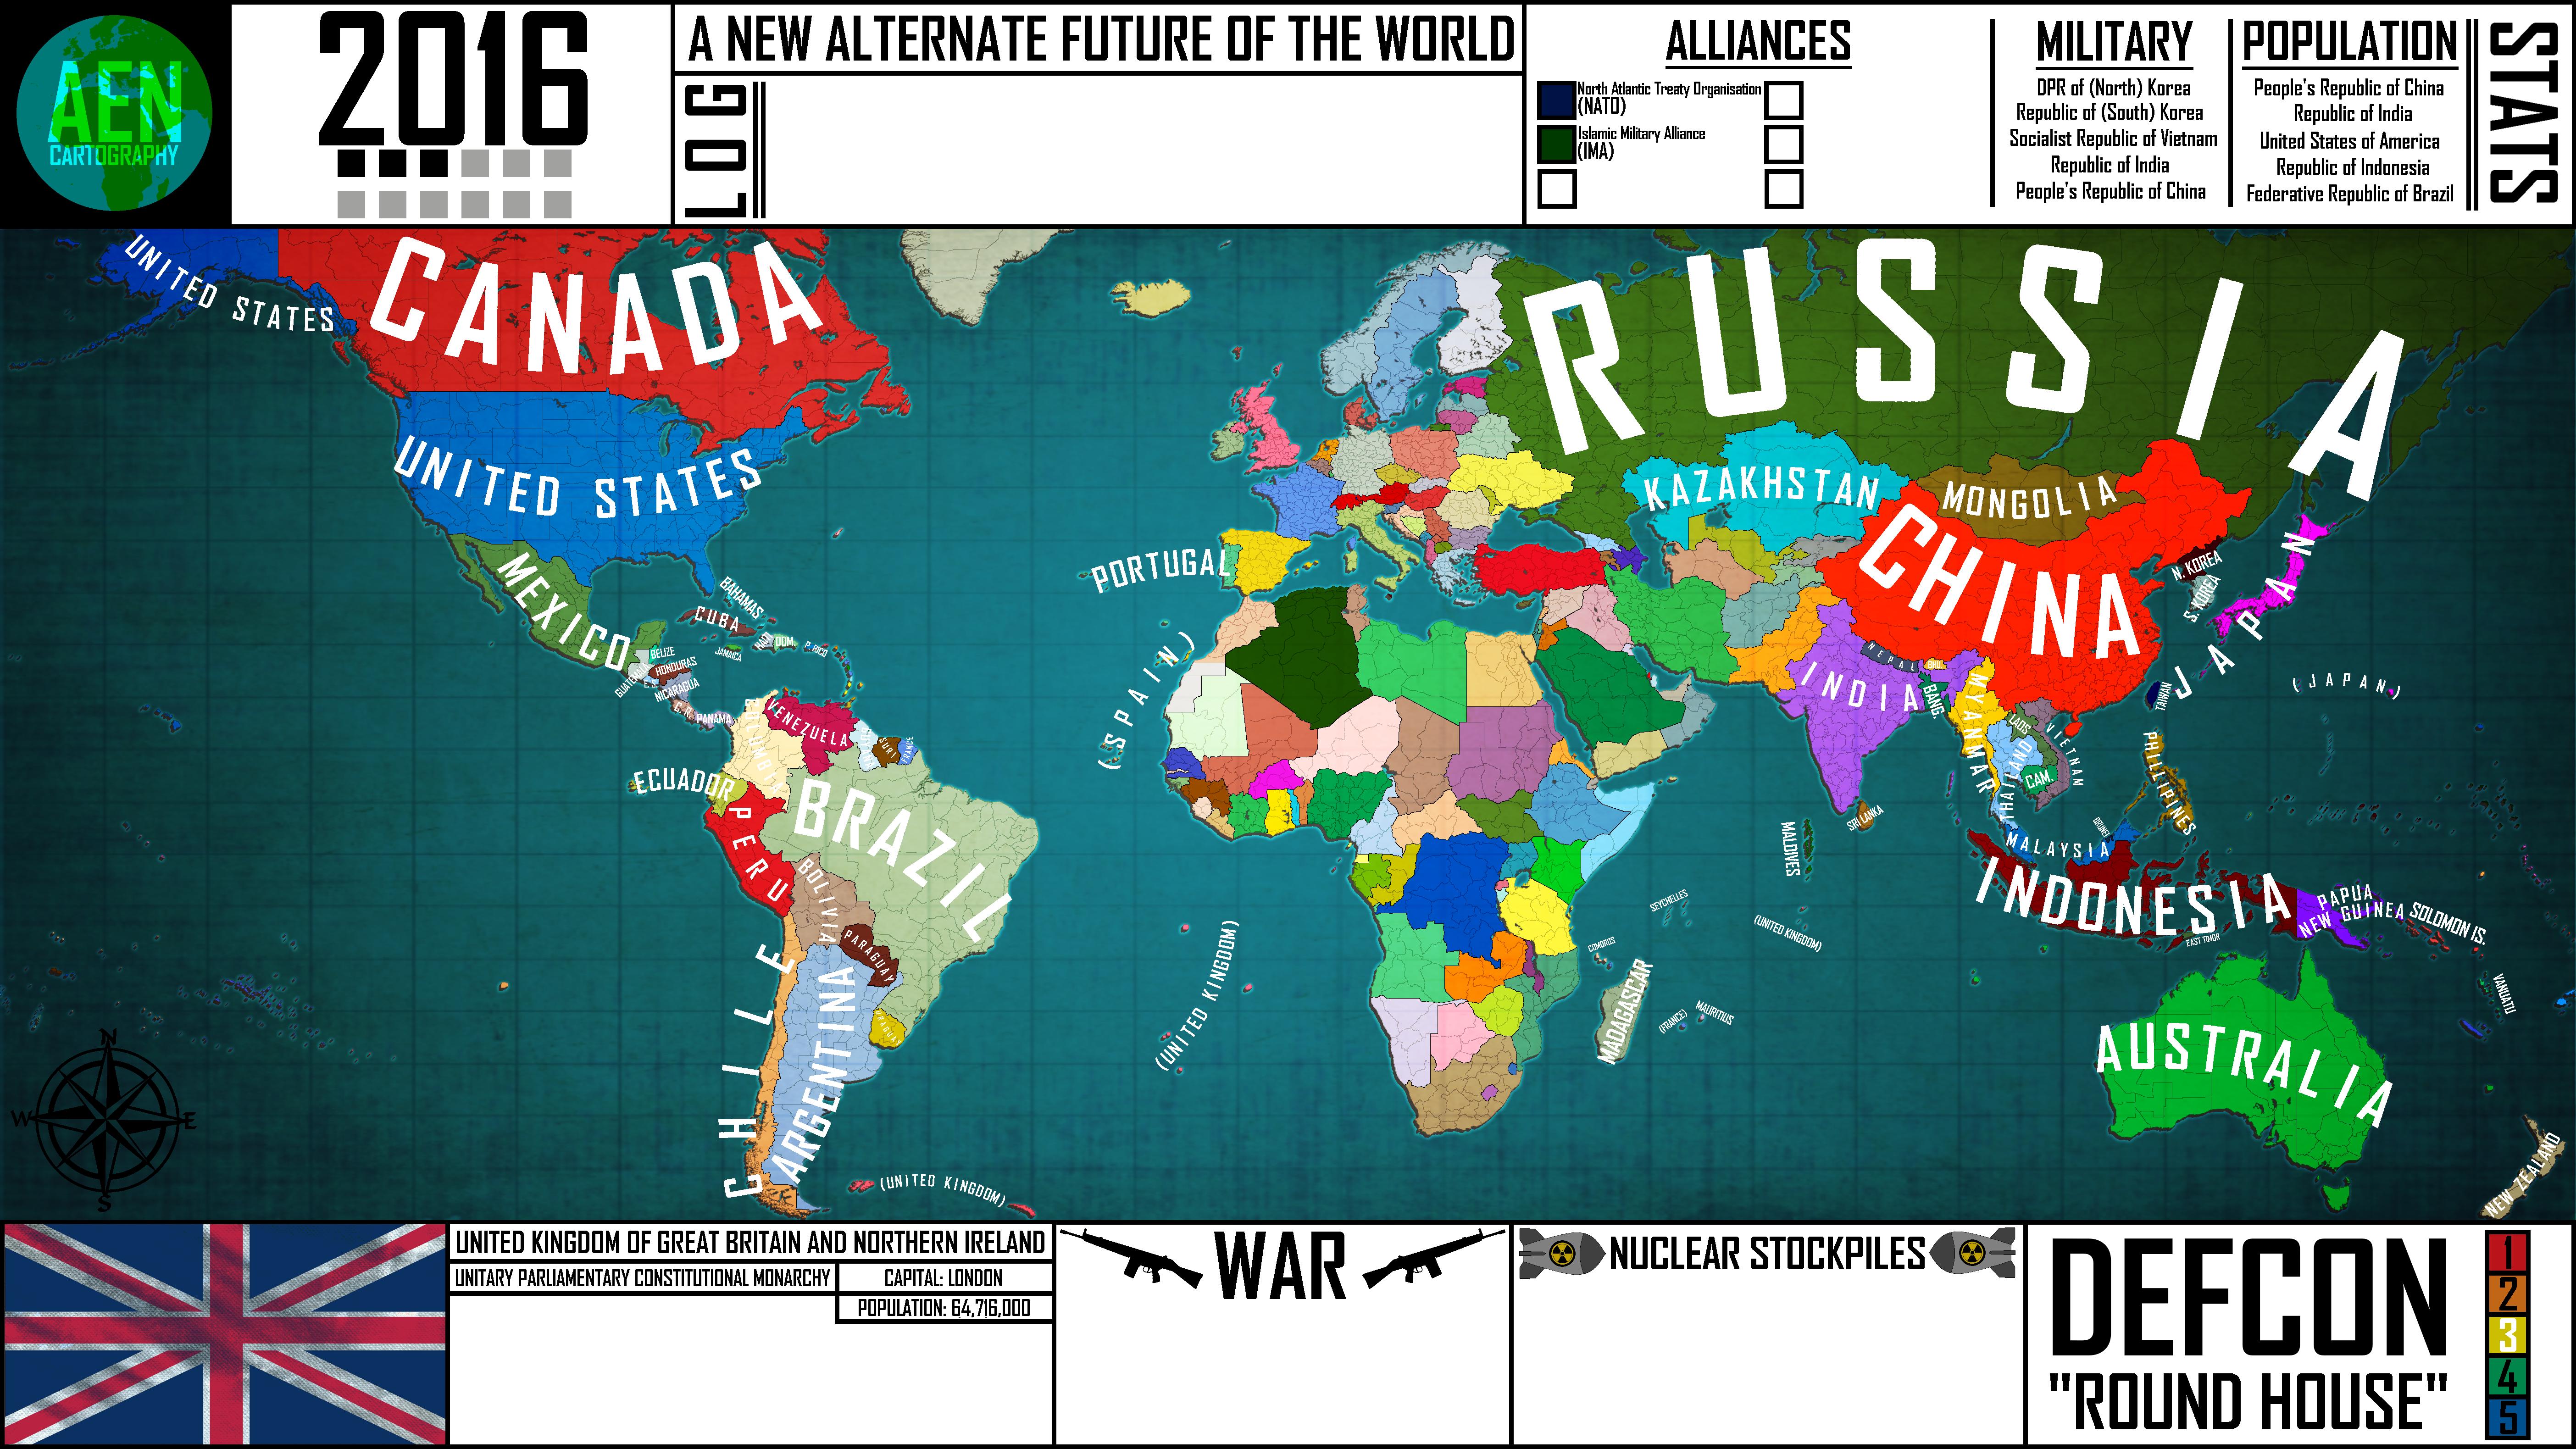 AenMaps AenMaps DeviantArt - Future map of the united states